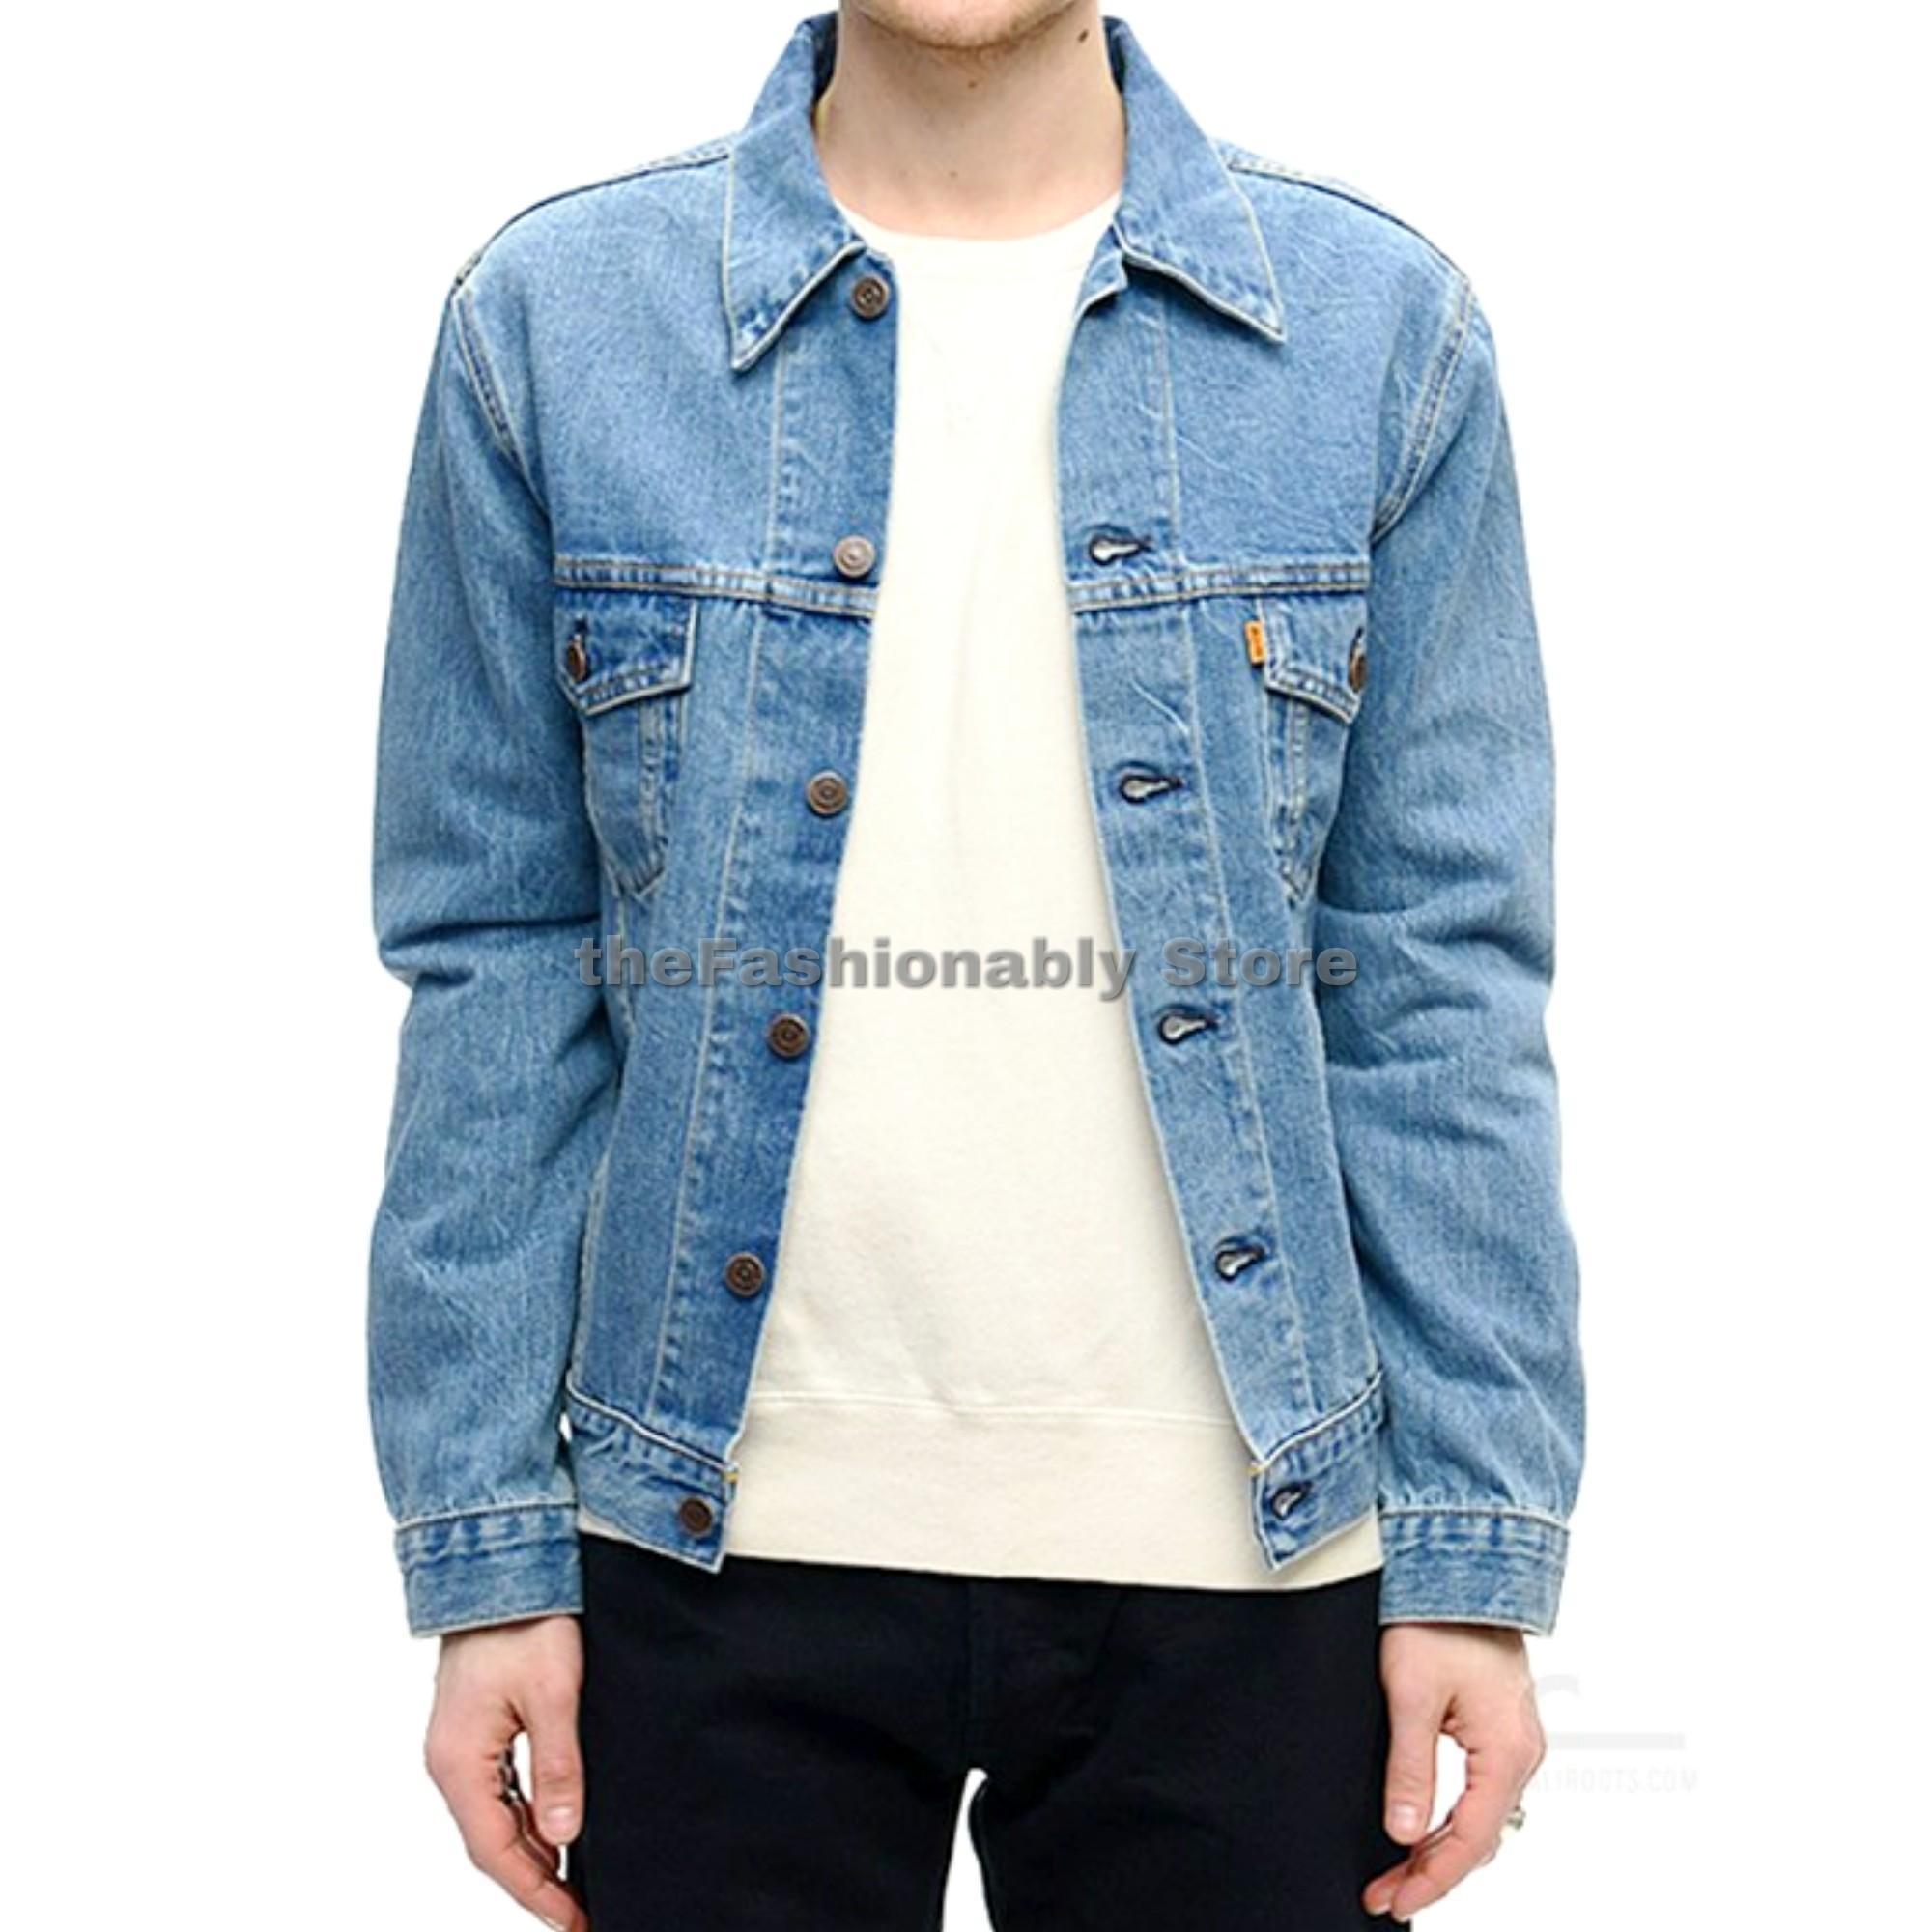 BIG SIZE Jaket Jeans Denim Biru Muda Pria - Premium Quality